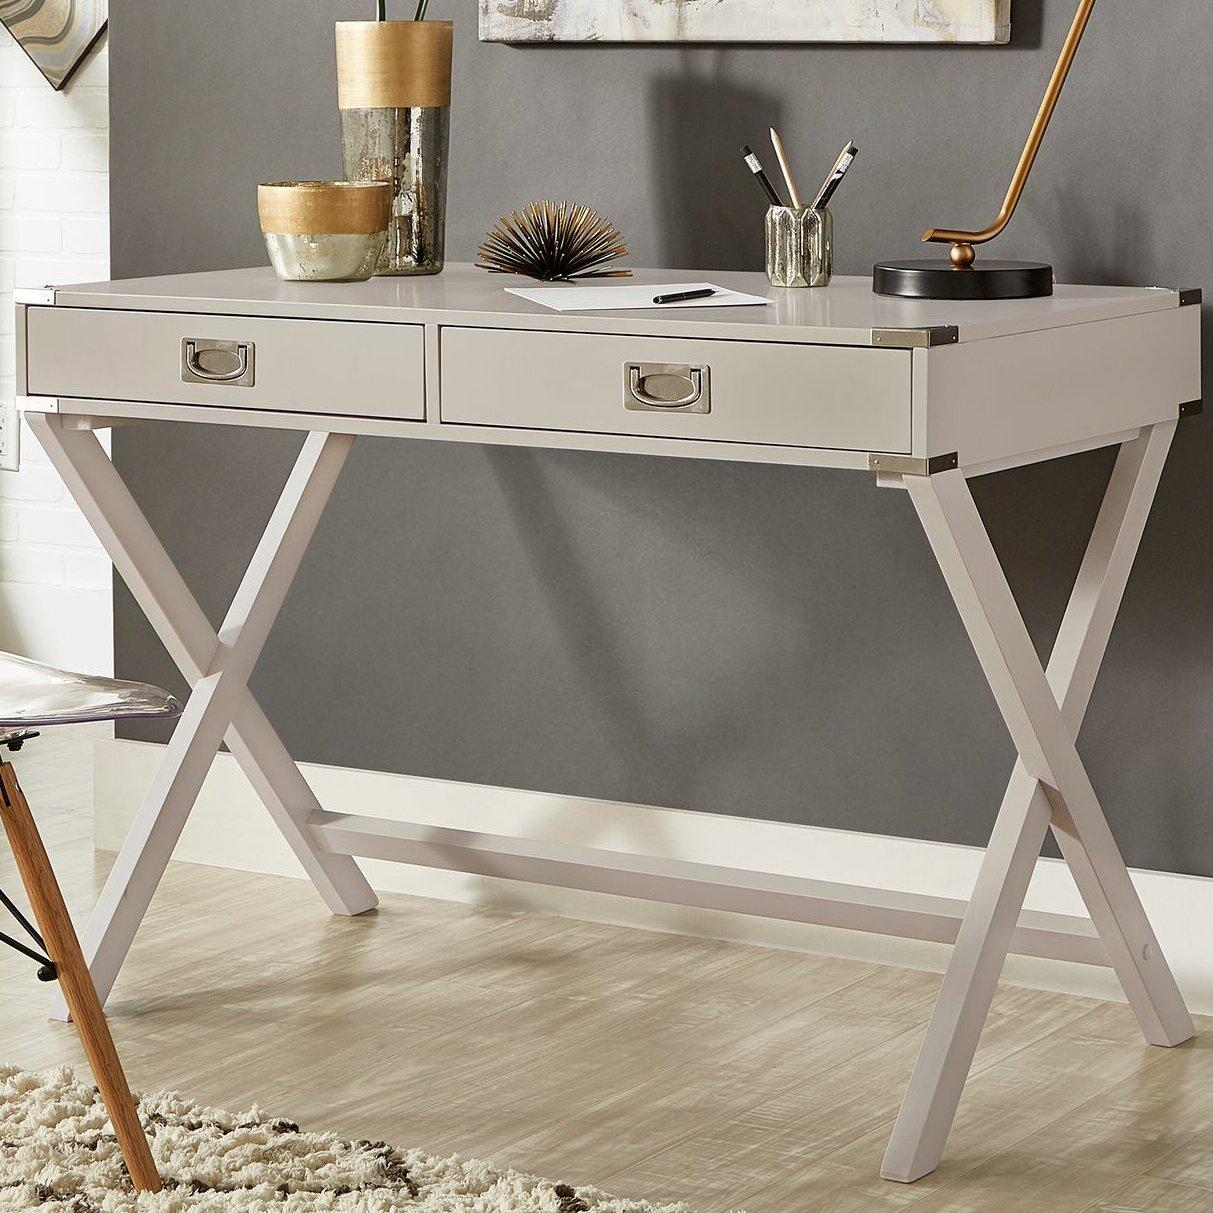 bassett writing desk asp home gustavian wood furnishings style